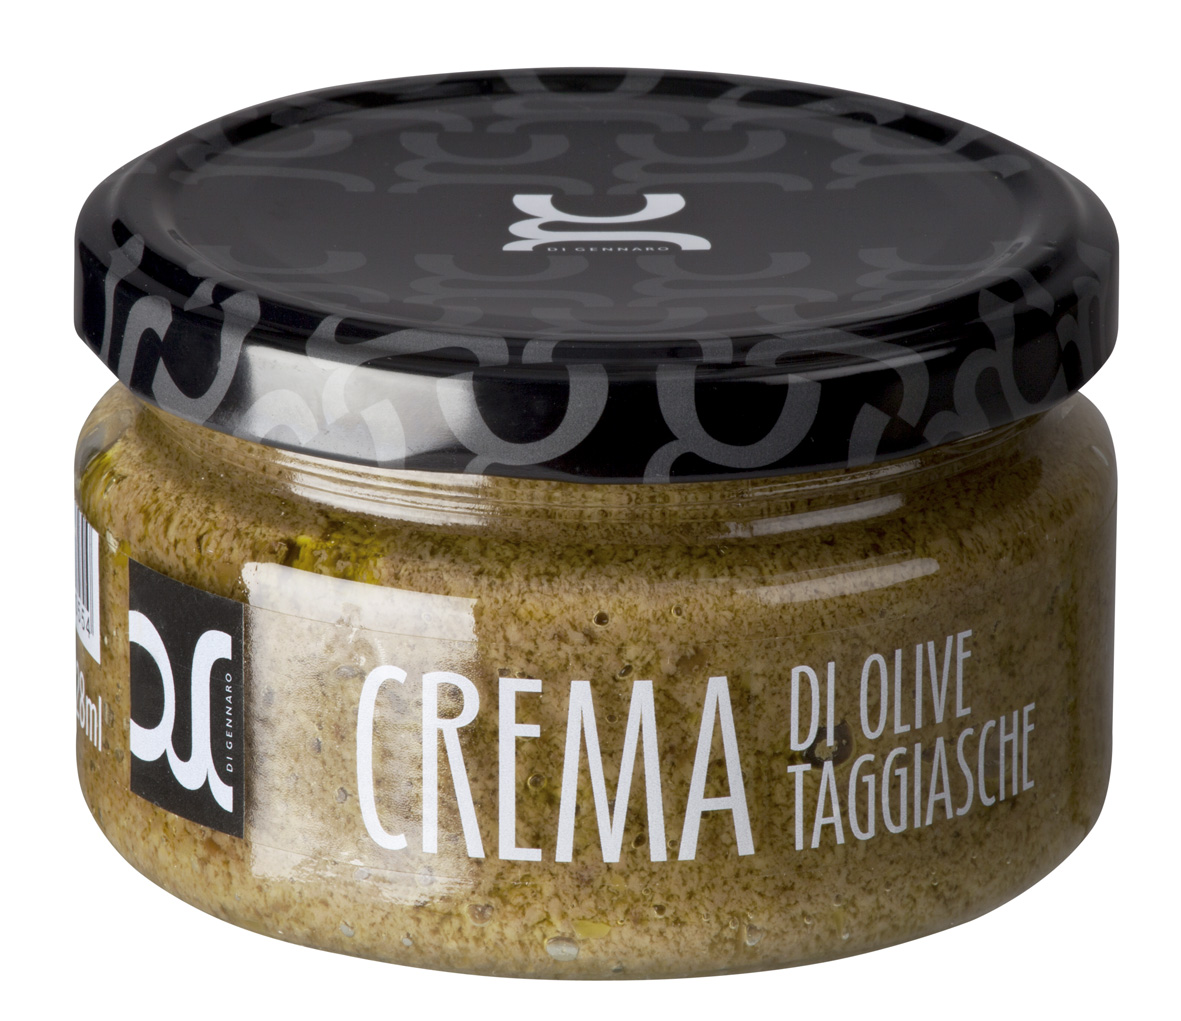 Crema di olive Taggiasche 228 ML Glas DIGE